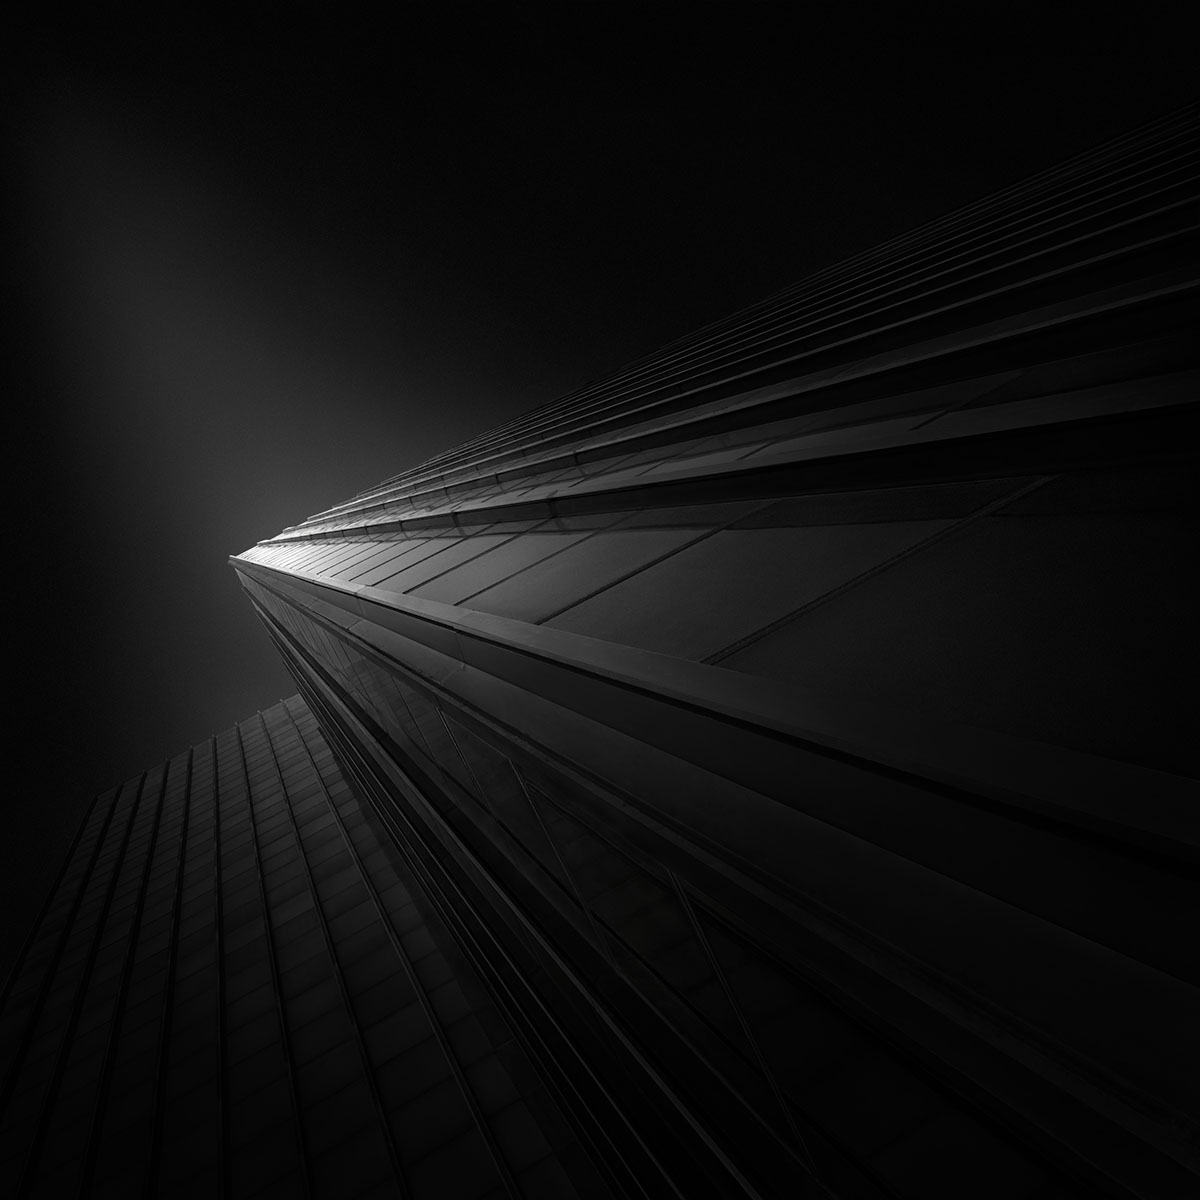 Ode to Black   Black Hope III - Animus Black © Julia Anna Gospodarou 2013